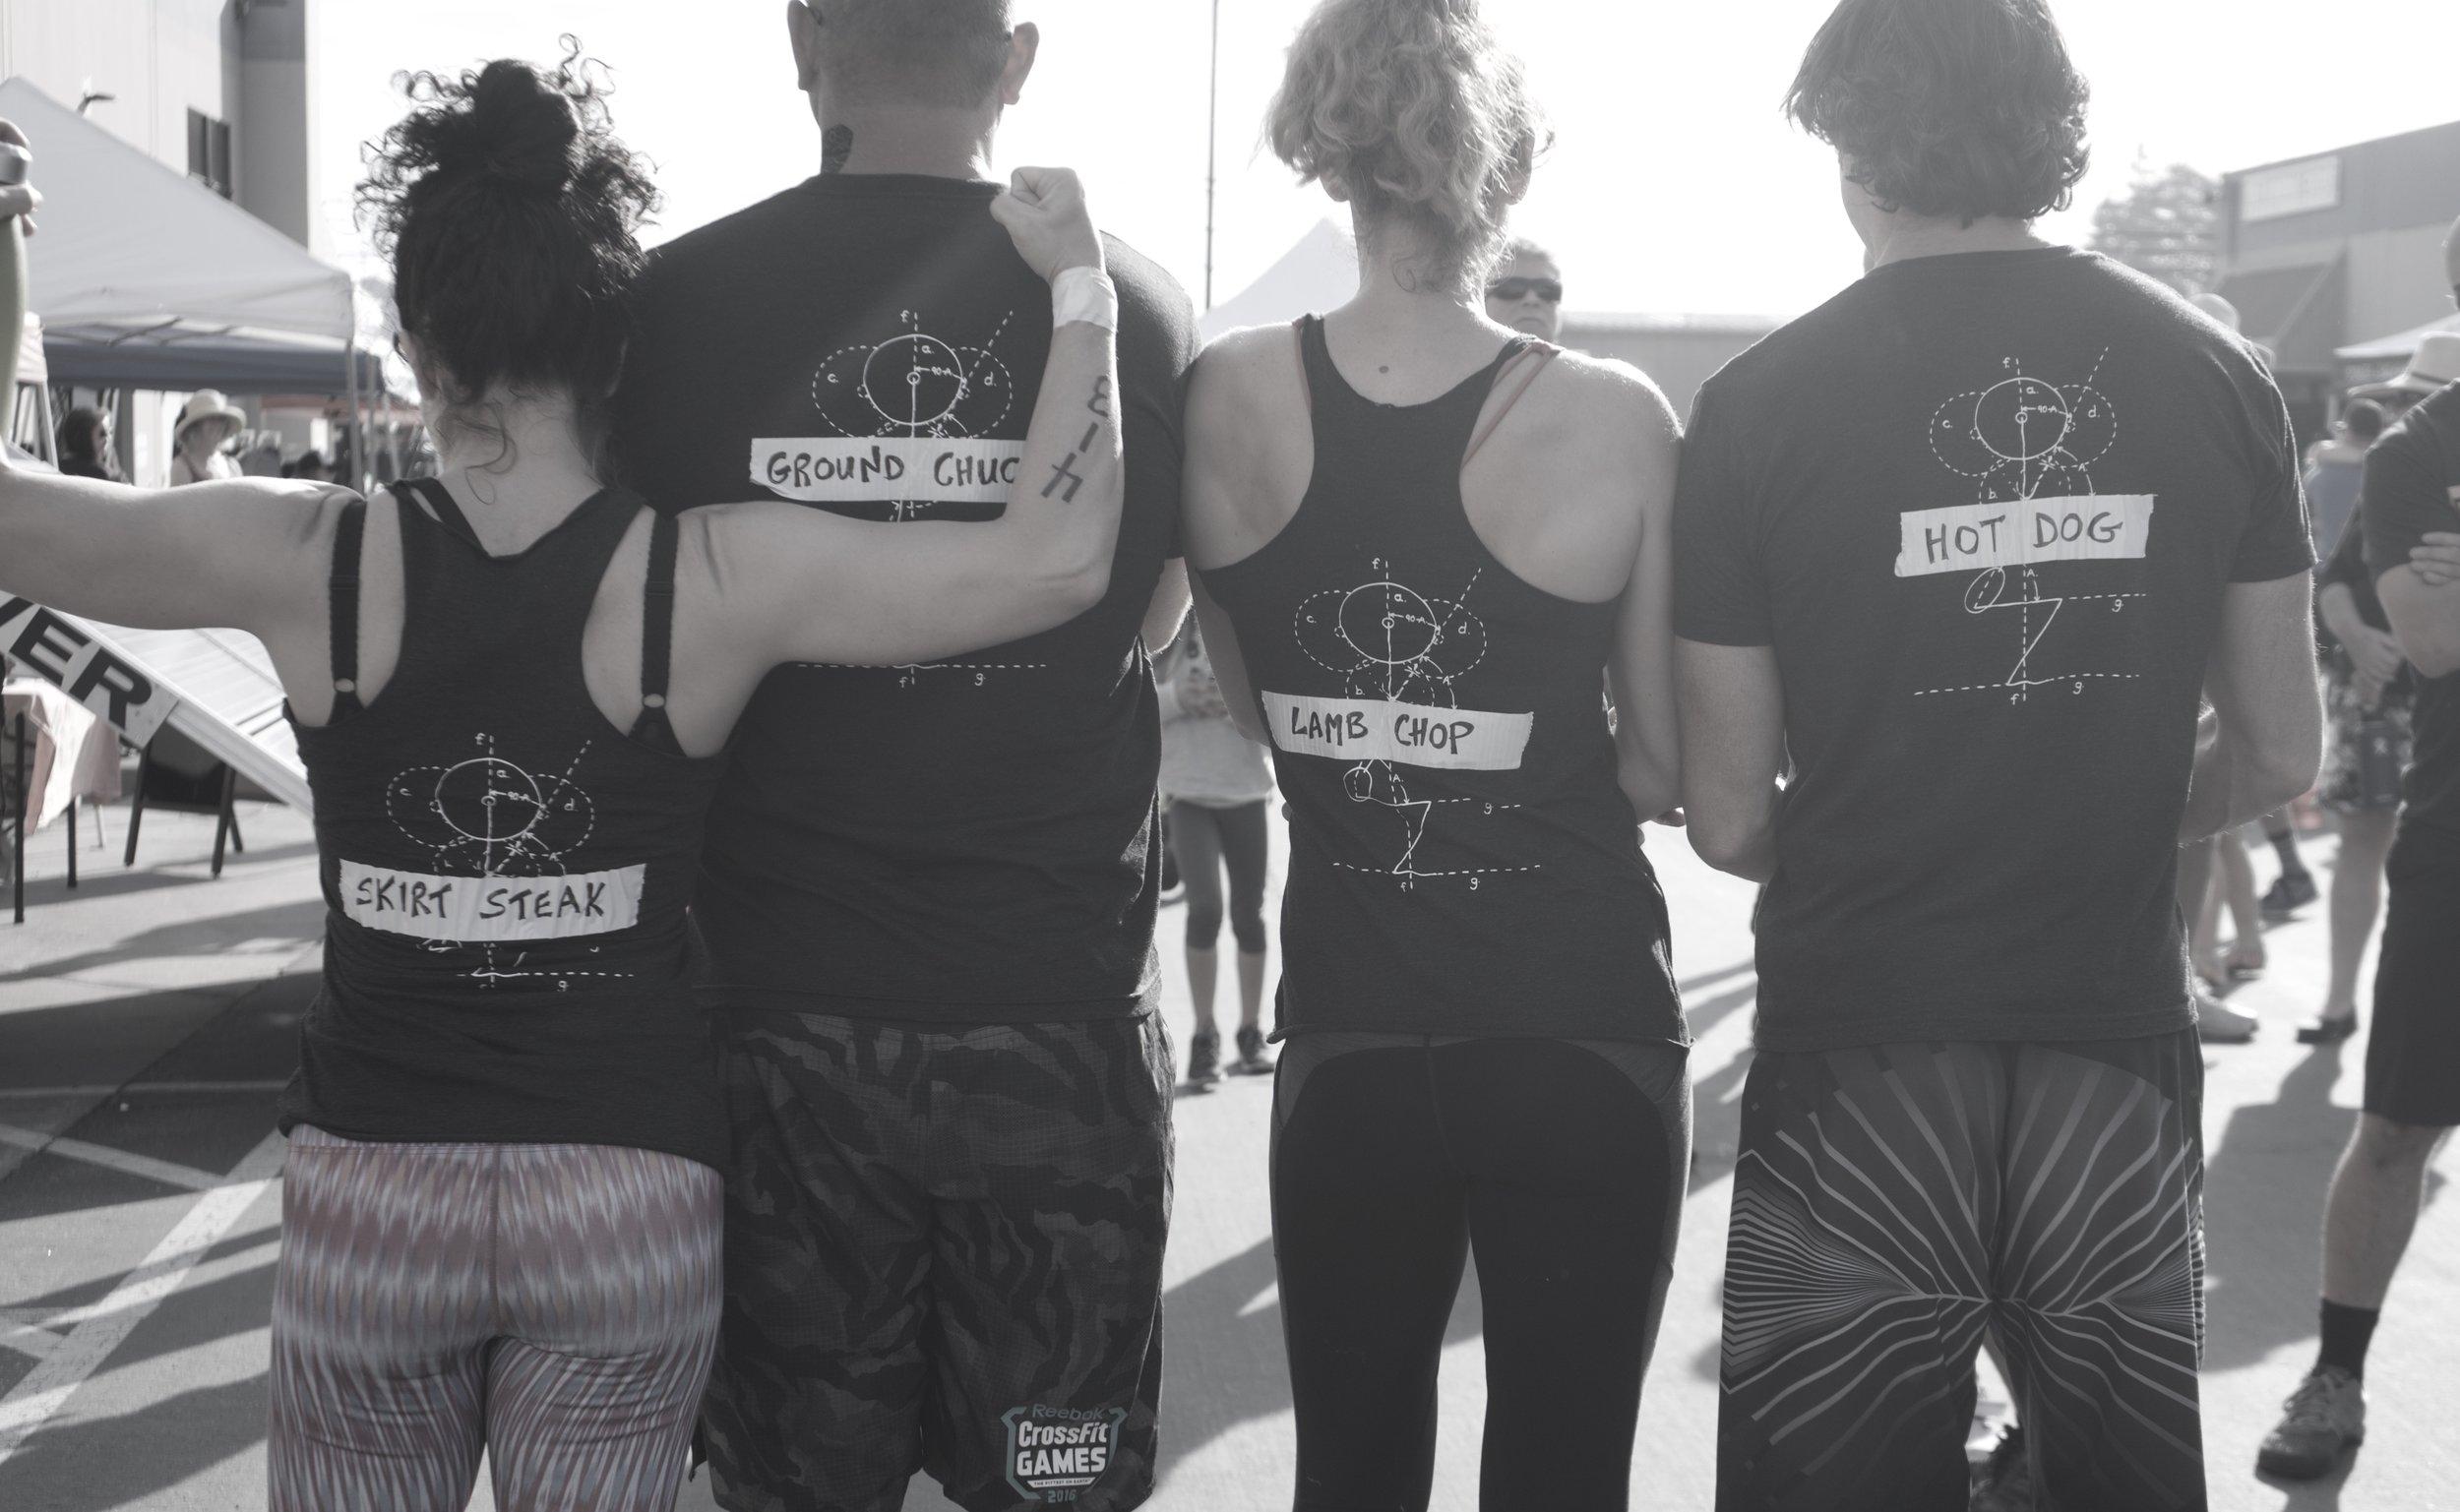 CrossFit Santa Cruz's Master team with their creative team uniforms!